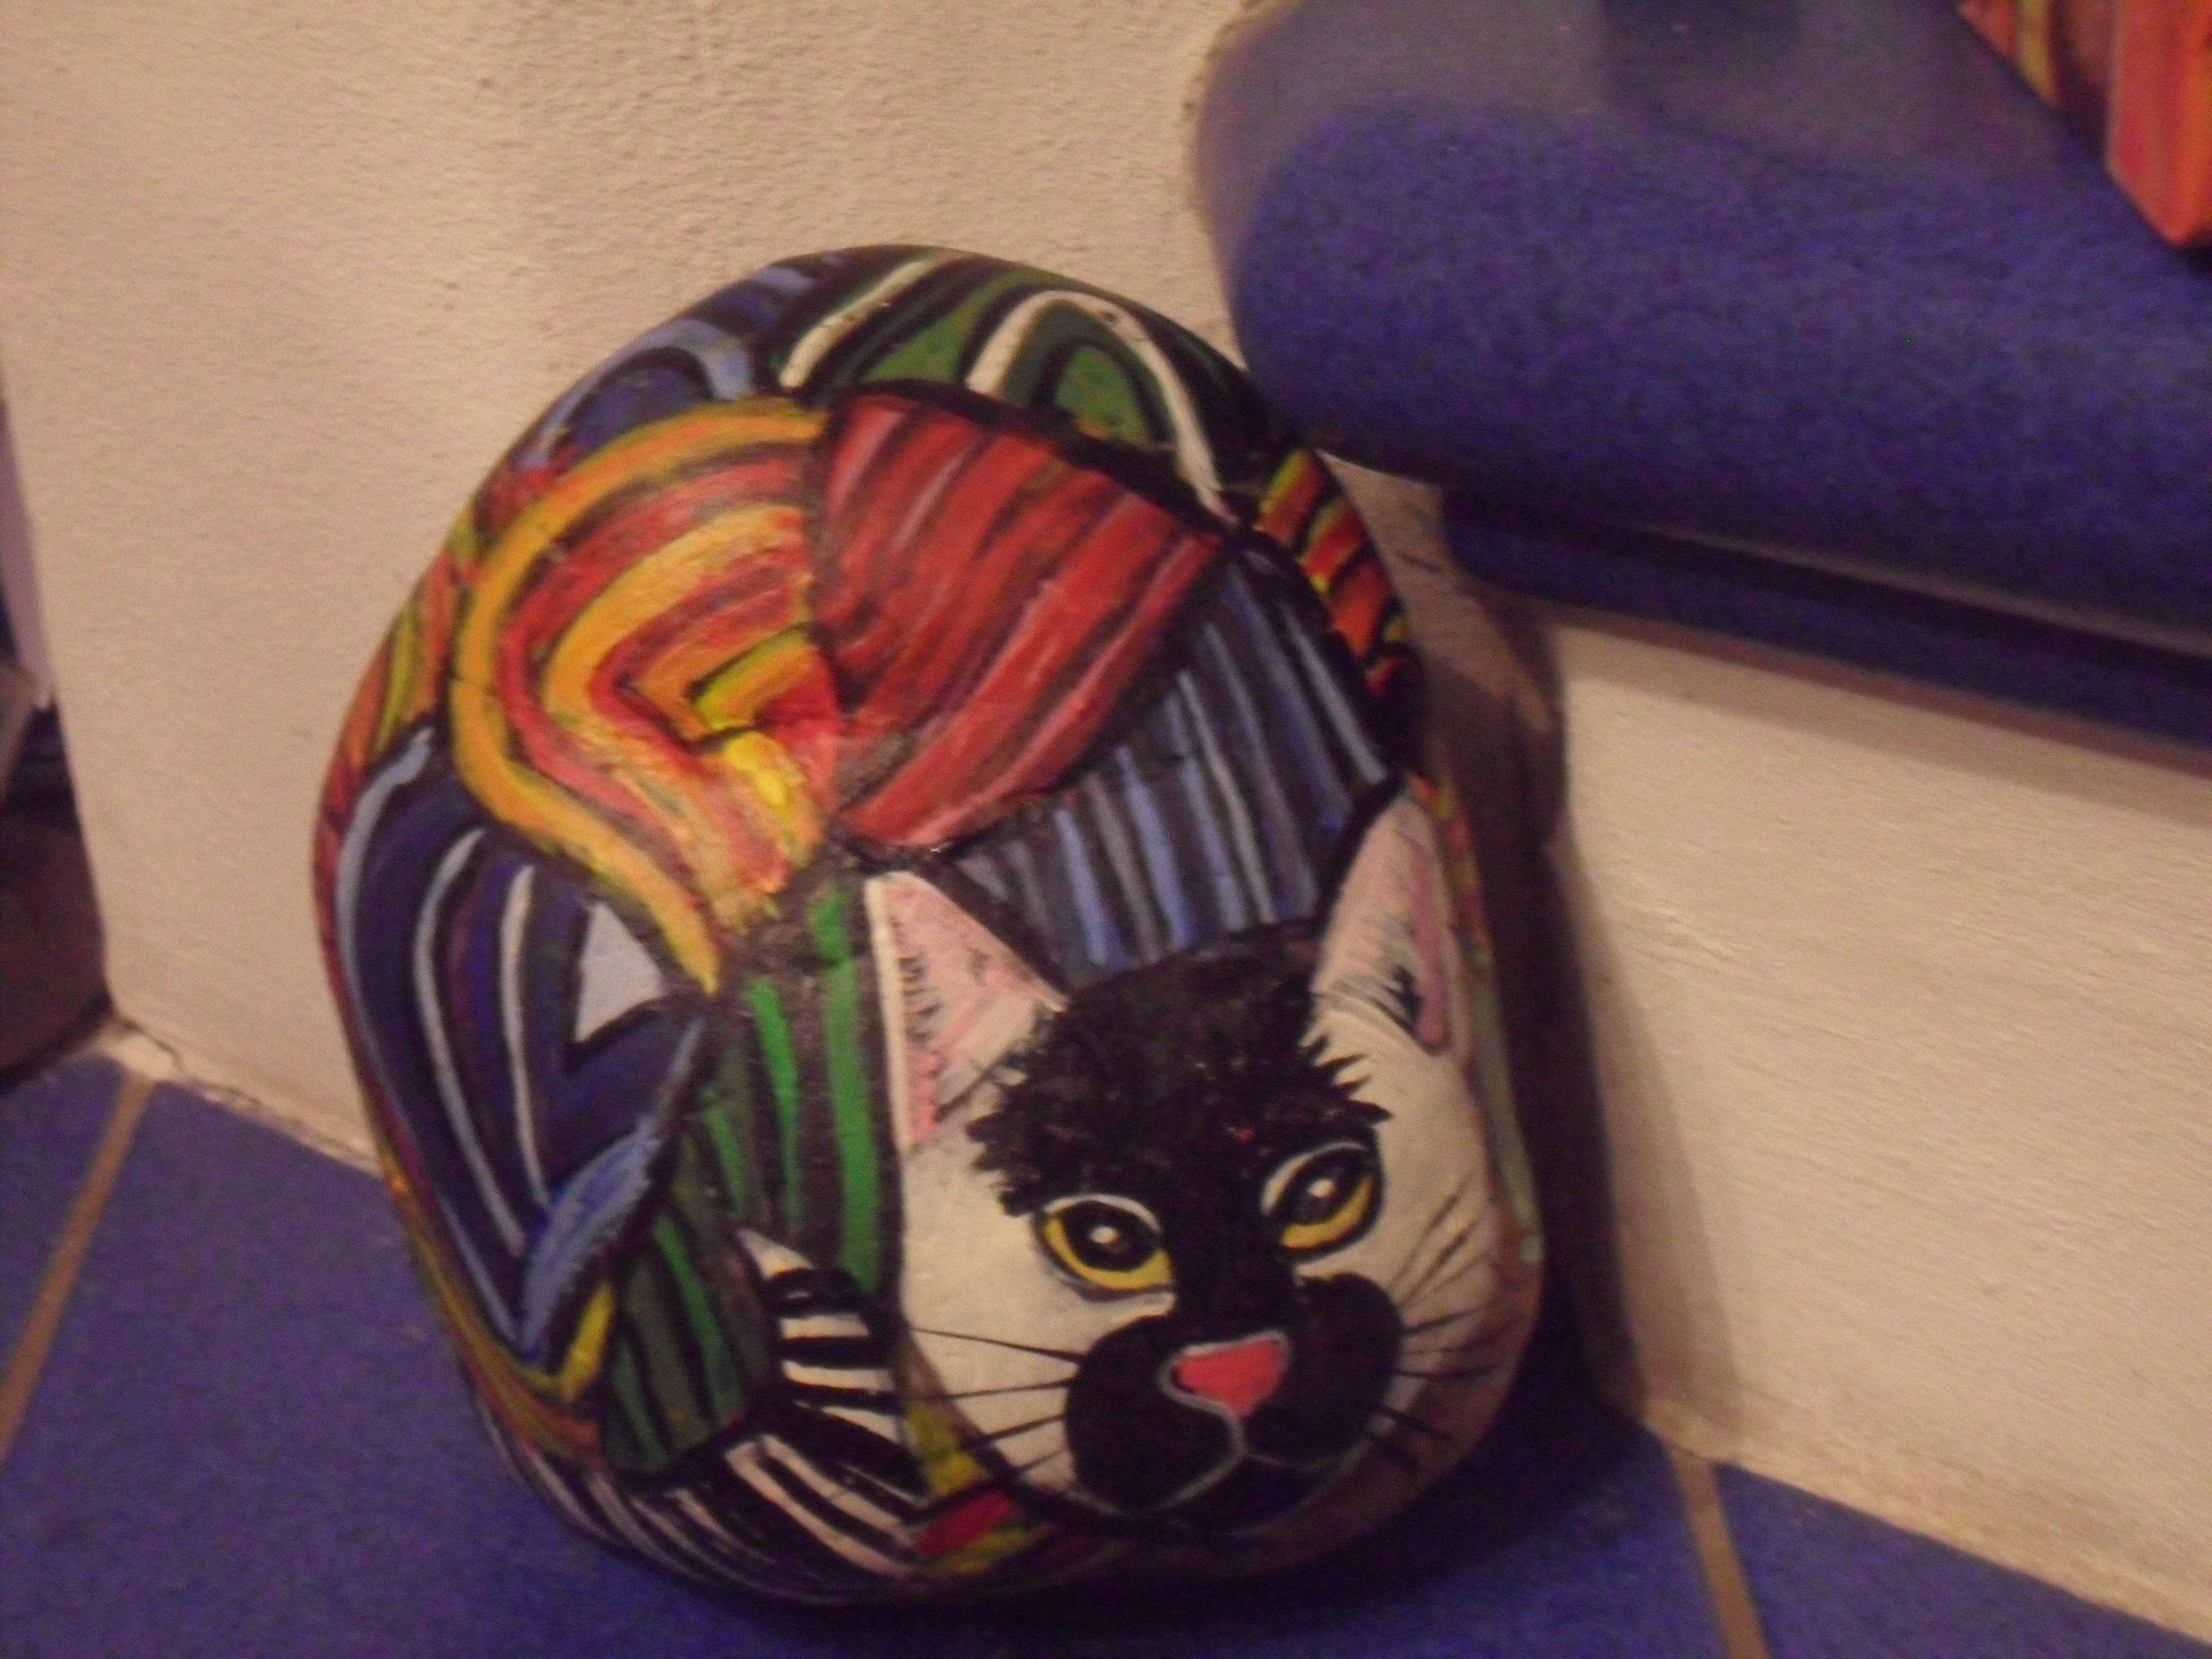 bemalter stein katze pop art kunst erh ltlich bei ebay bemalter stein bemalte steine katzen. Black Bedroom Furniture Sets. Home Design Ideas